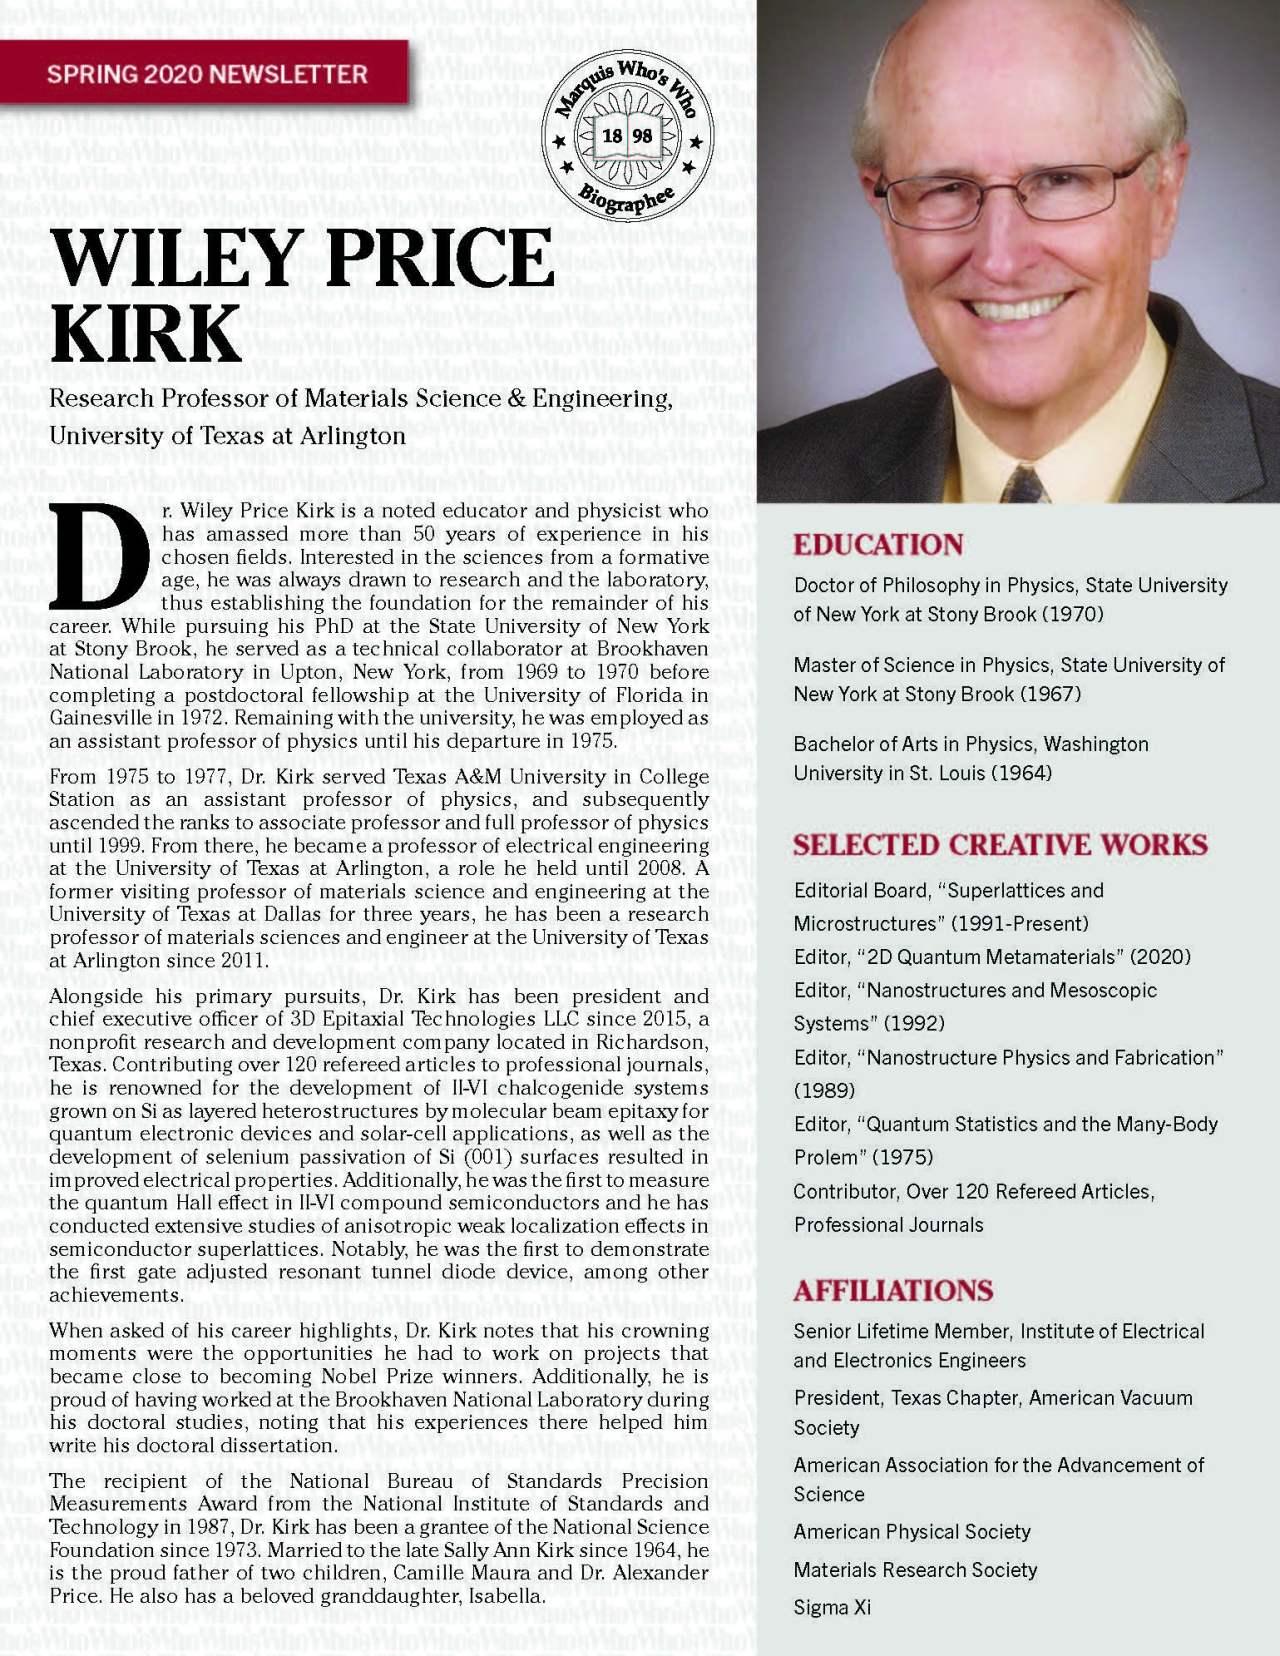 Kirk, Wiley 4820493_23528624 Newsletter